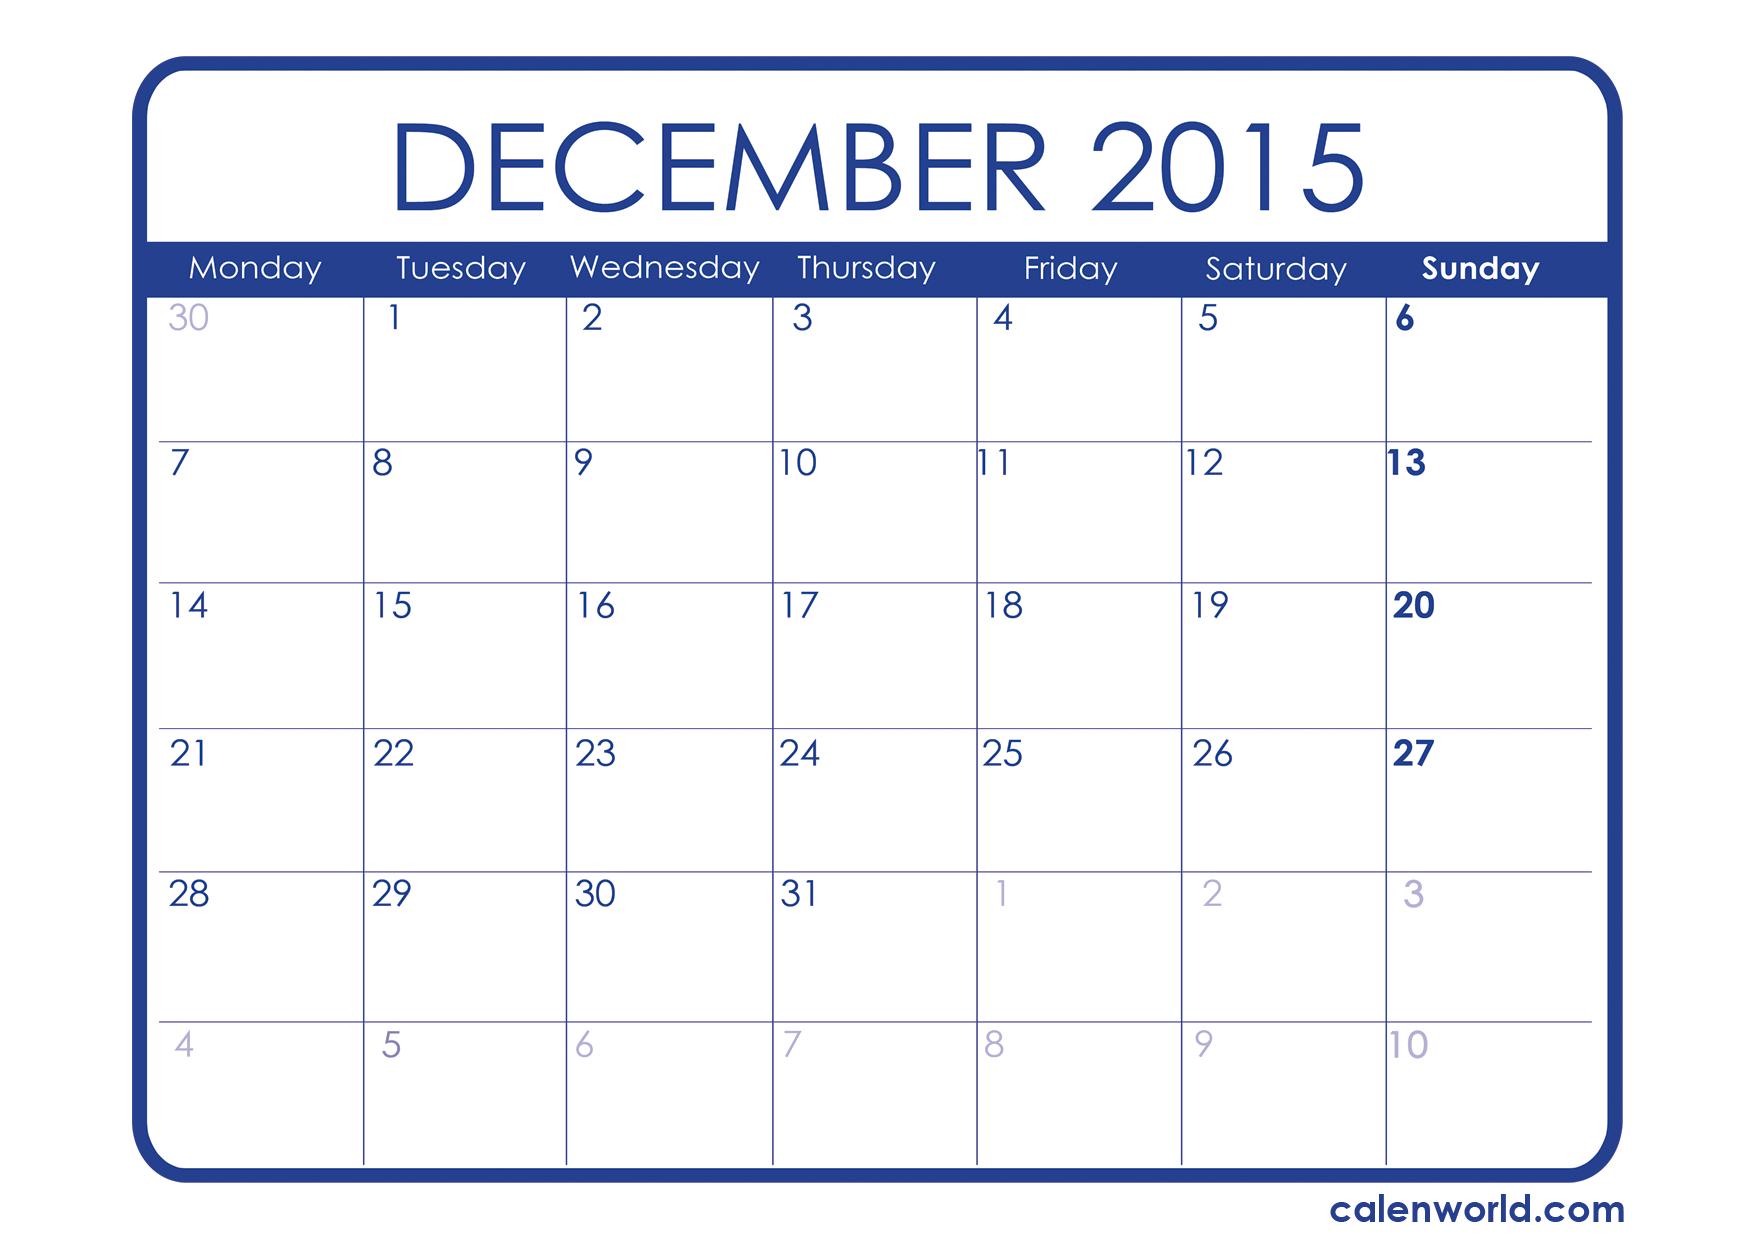 December 2015 calendar clipart image transparent download December 2015 Calendar Printable Calendars - Clipart Kid image transparent download